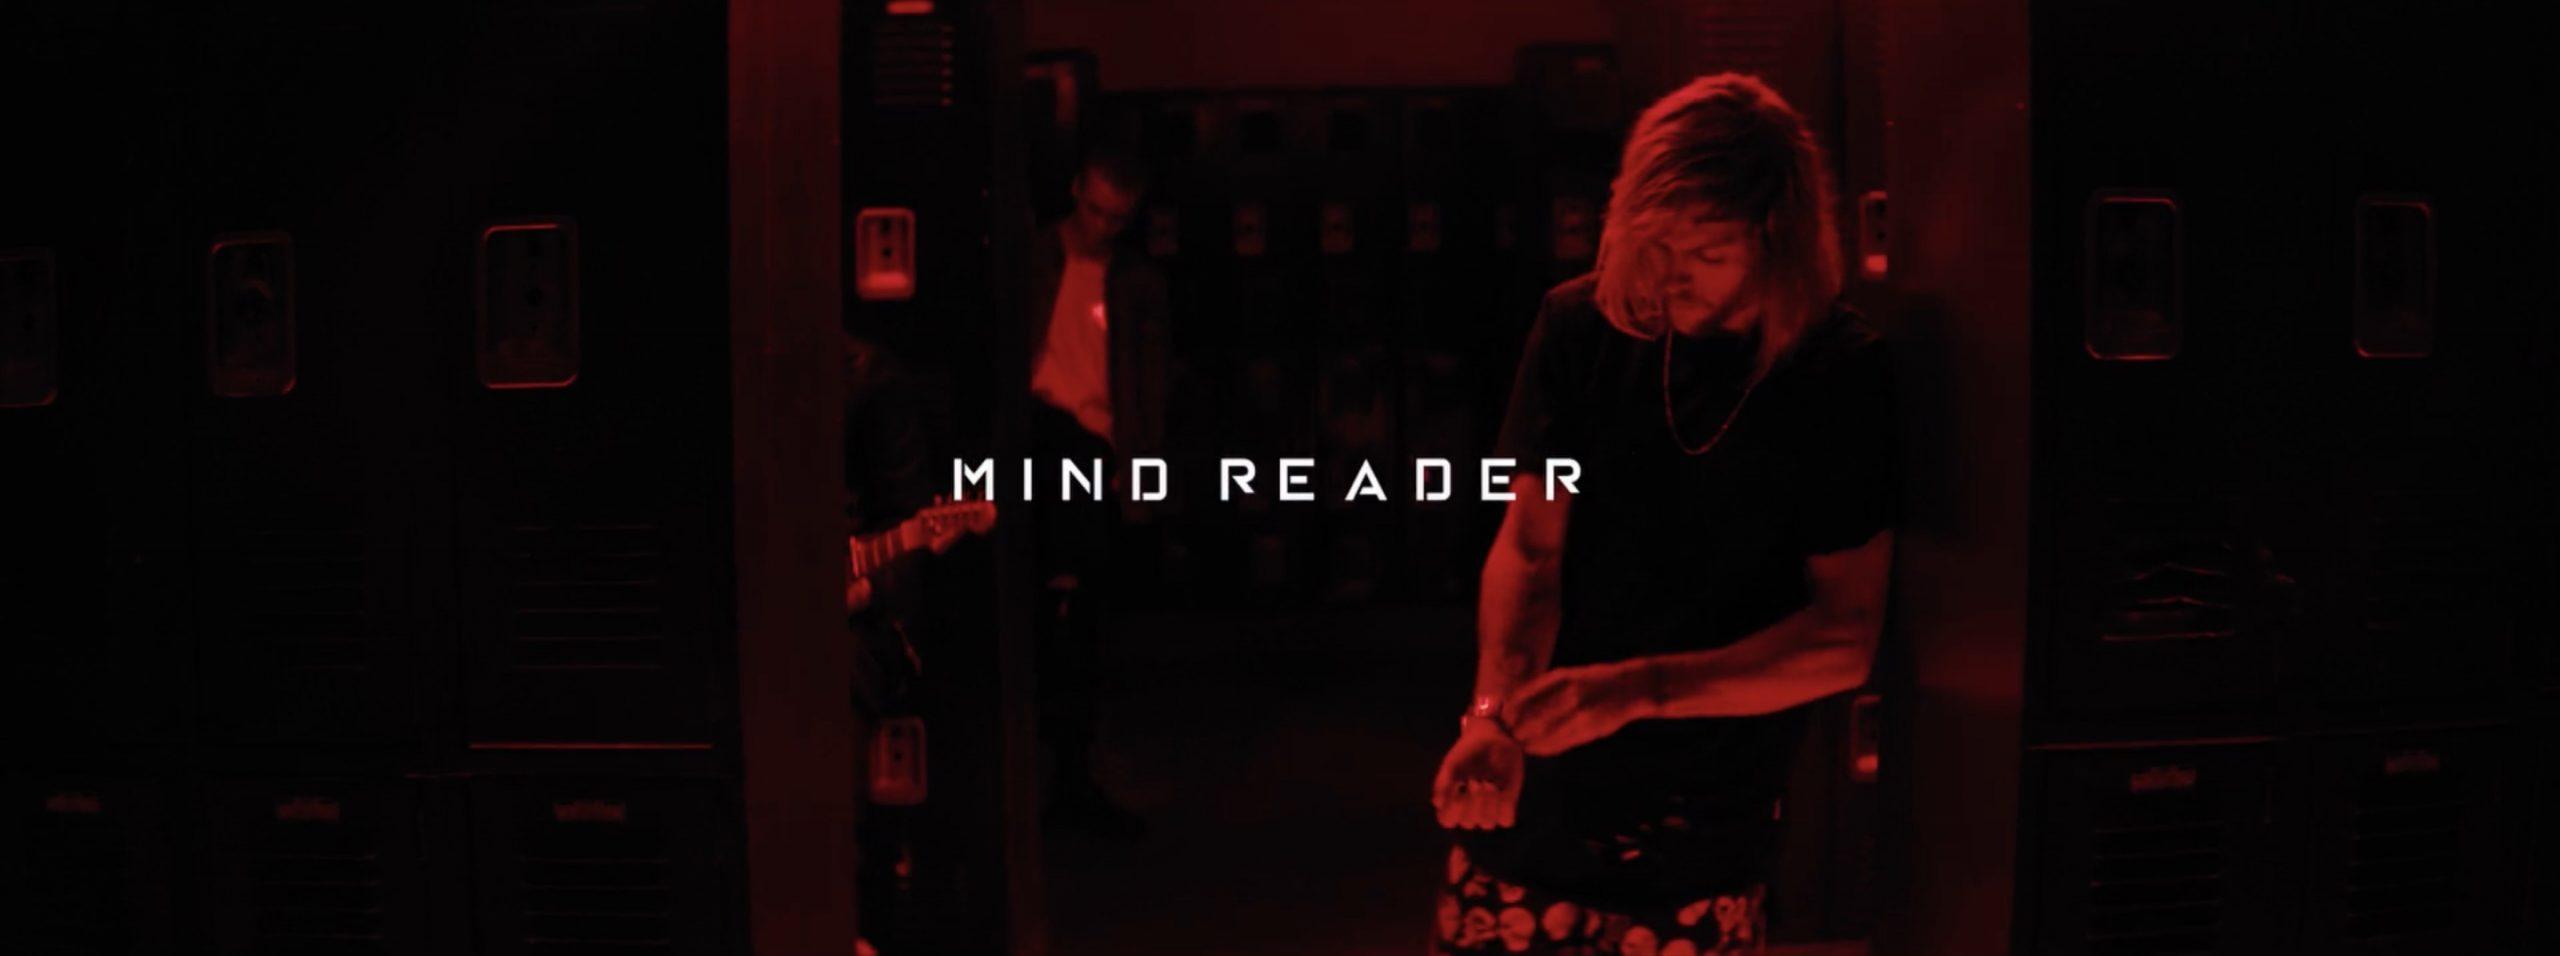 NEFFEX FT MASN Mind Reader Director Santiago Salviche 777Productions-34